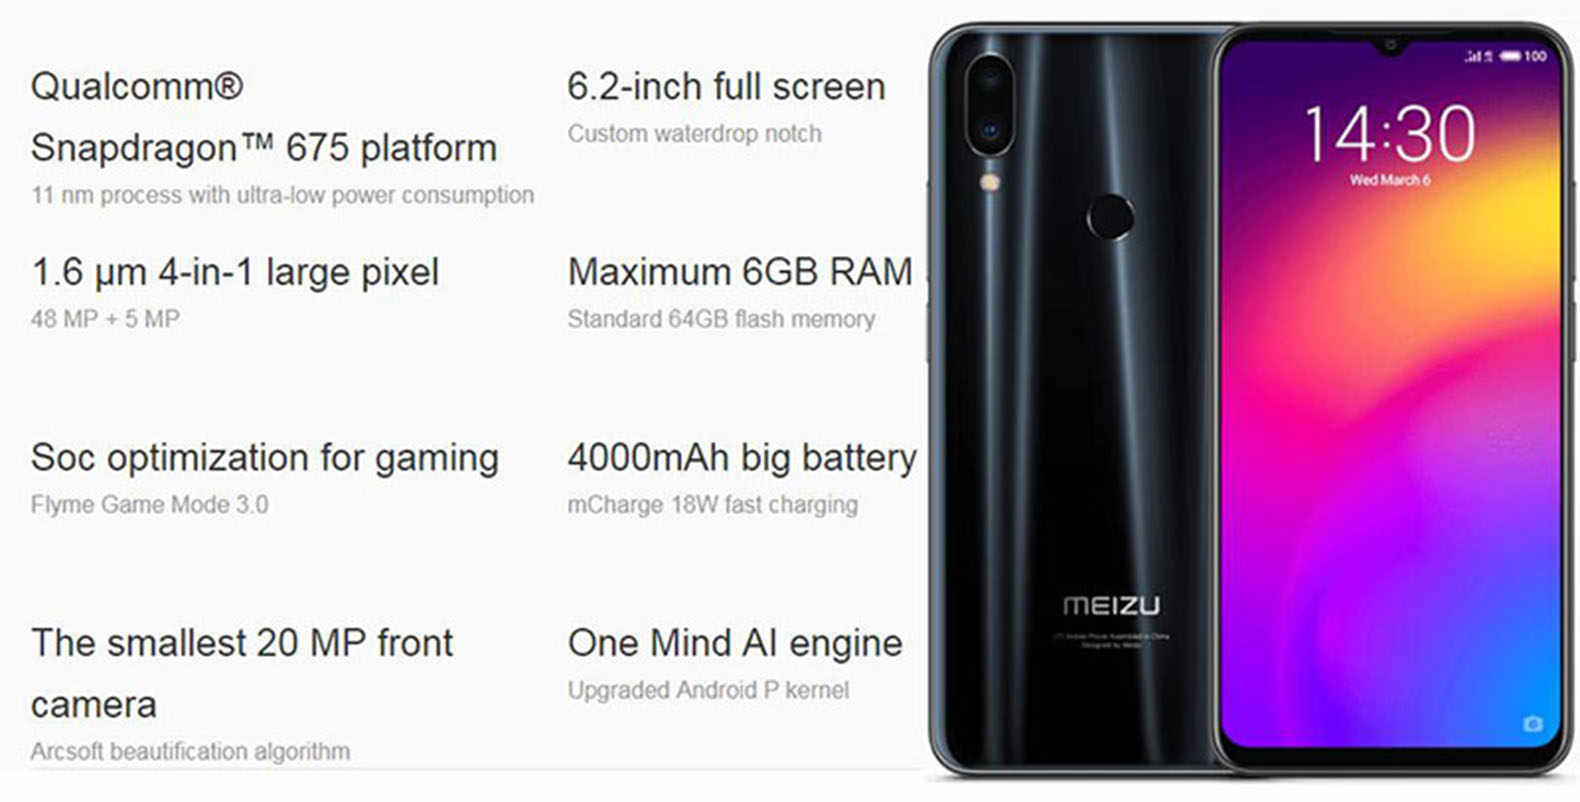 instock meizu Note 9 48 0mp Camera 4GB RAM 64GB ROM 4G LTE Snapdragon 675  Octa Core 6 2